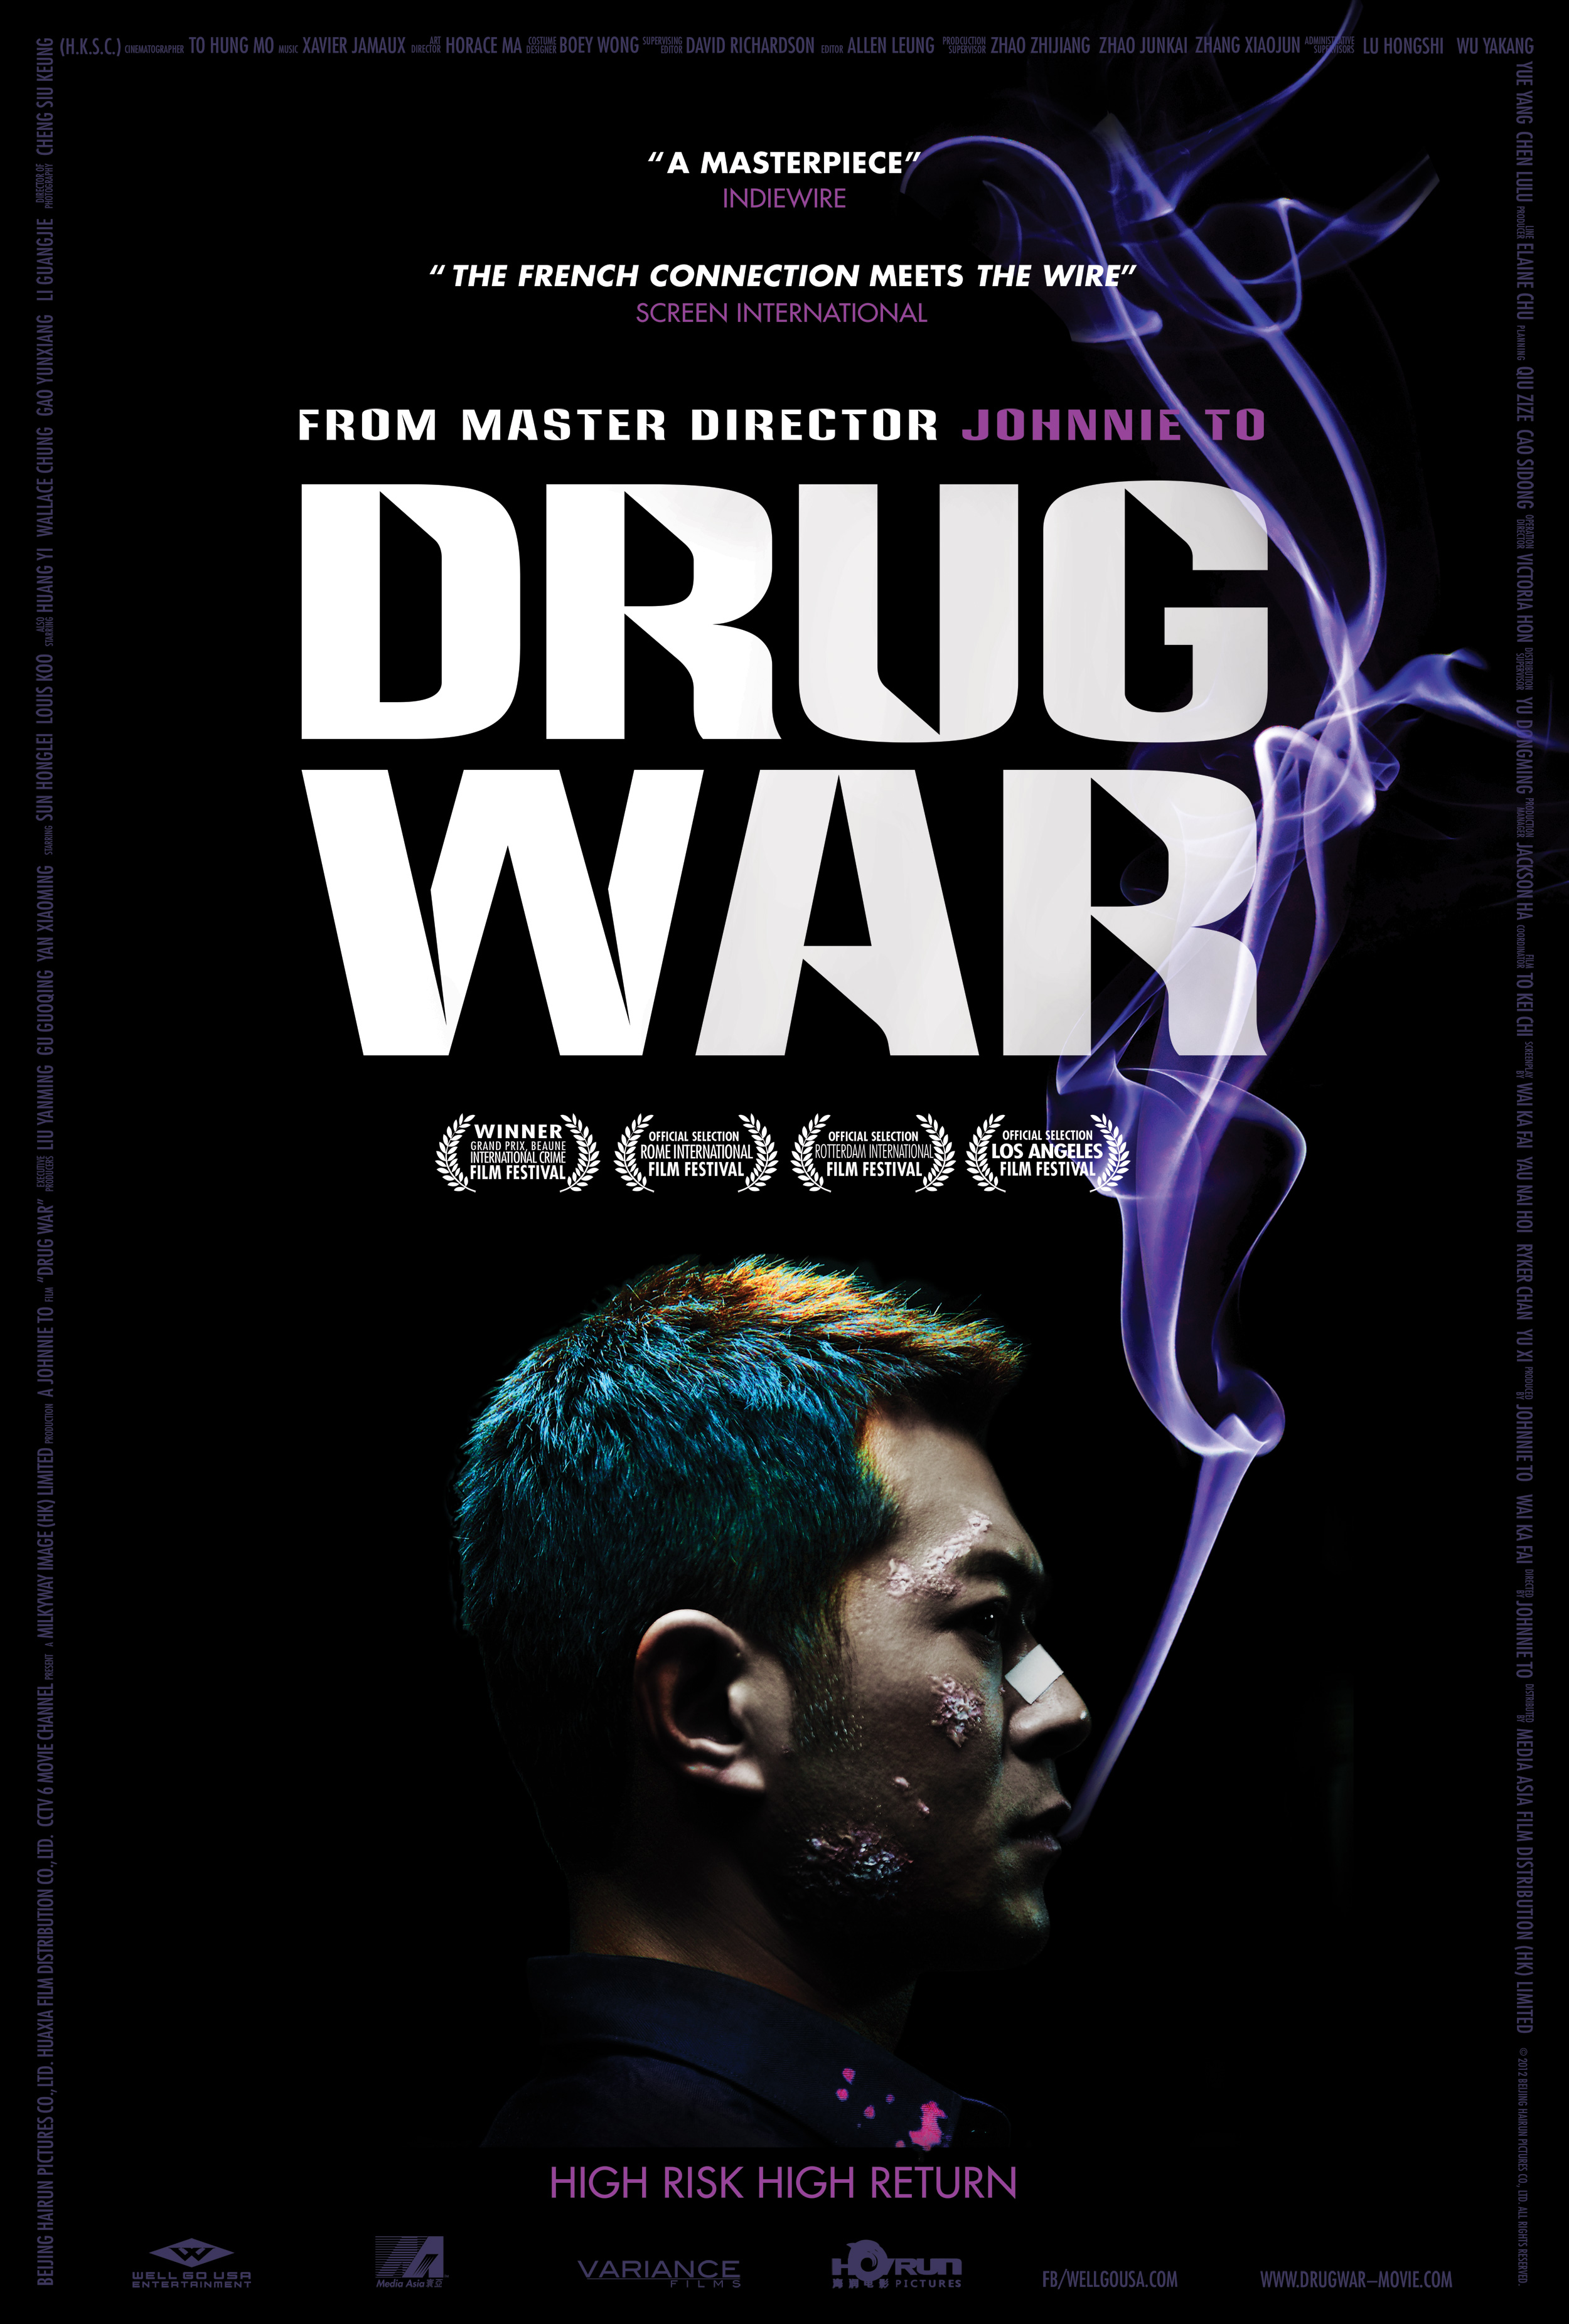 NYAFF '13: Johnnie To's 'Drug War' Movie Review